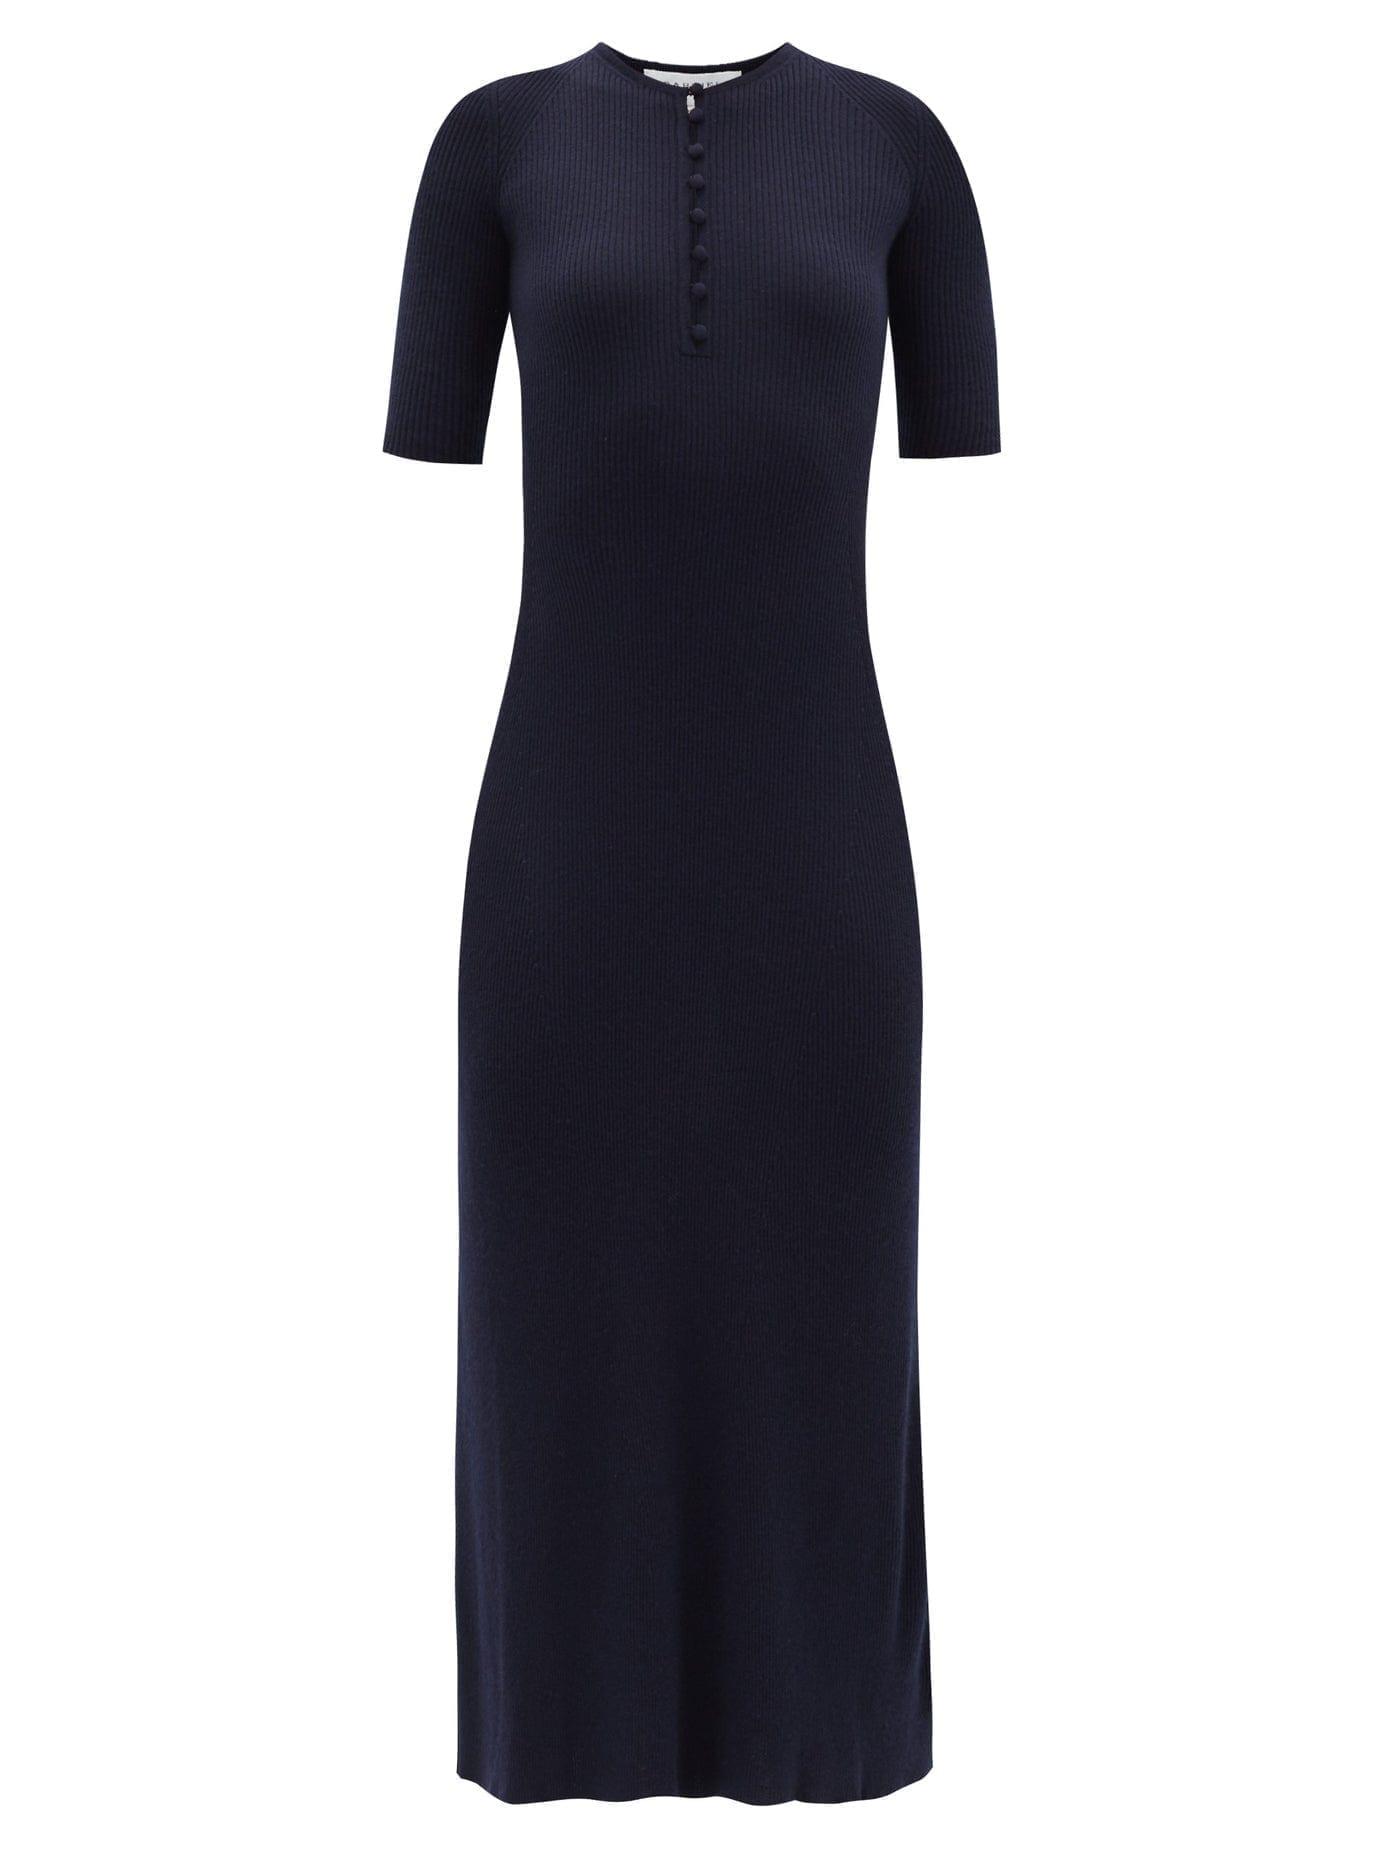 GABRIELA HEARST Johanna Ribbed Cashmere-blend Knitted Dress